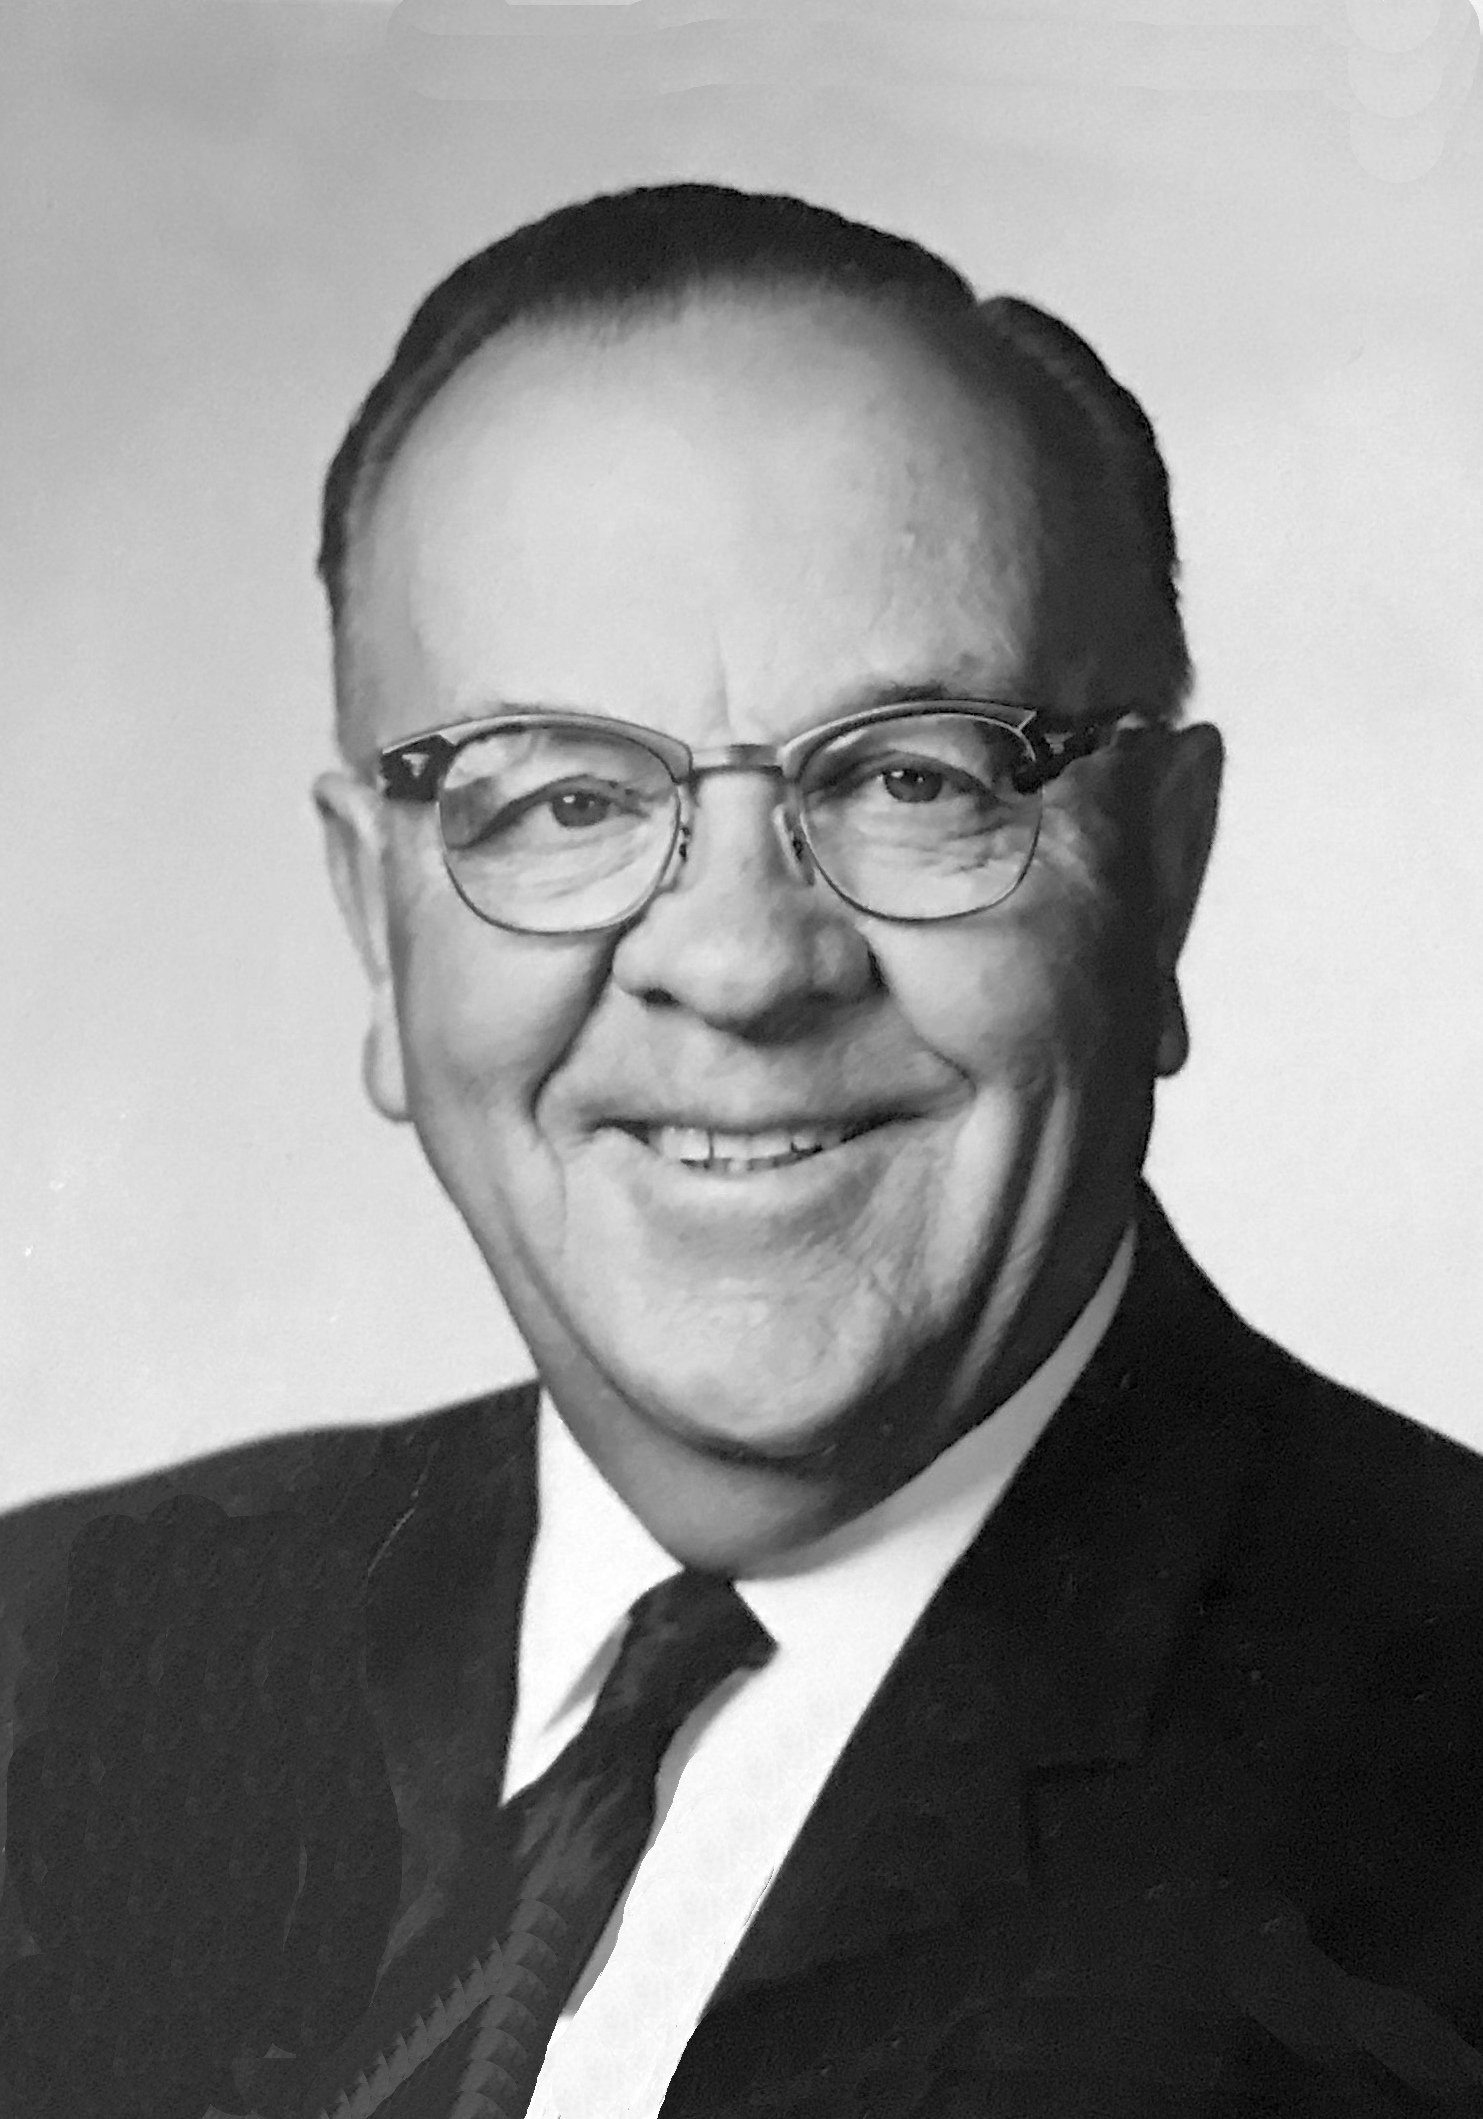 Atkinson, James Rudy